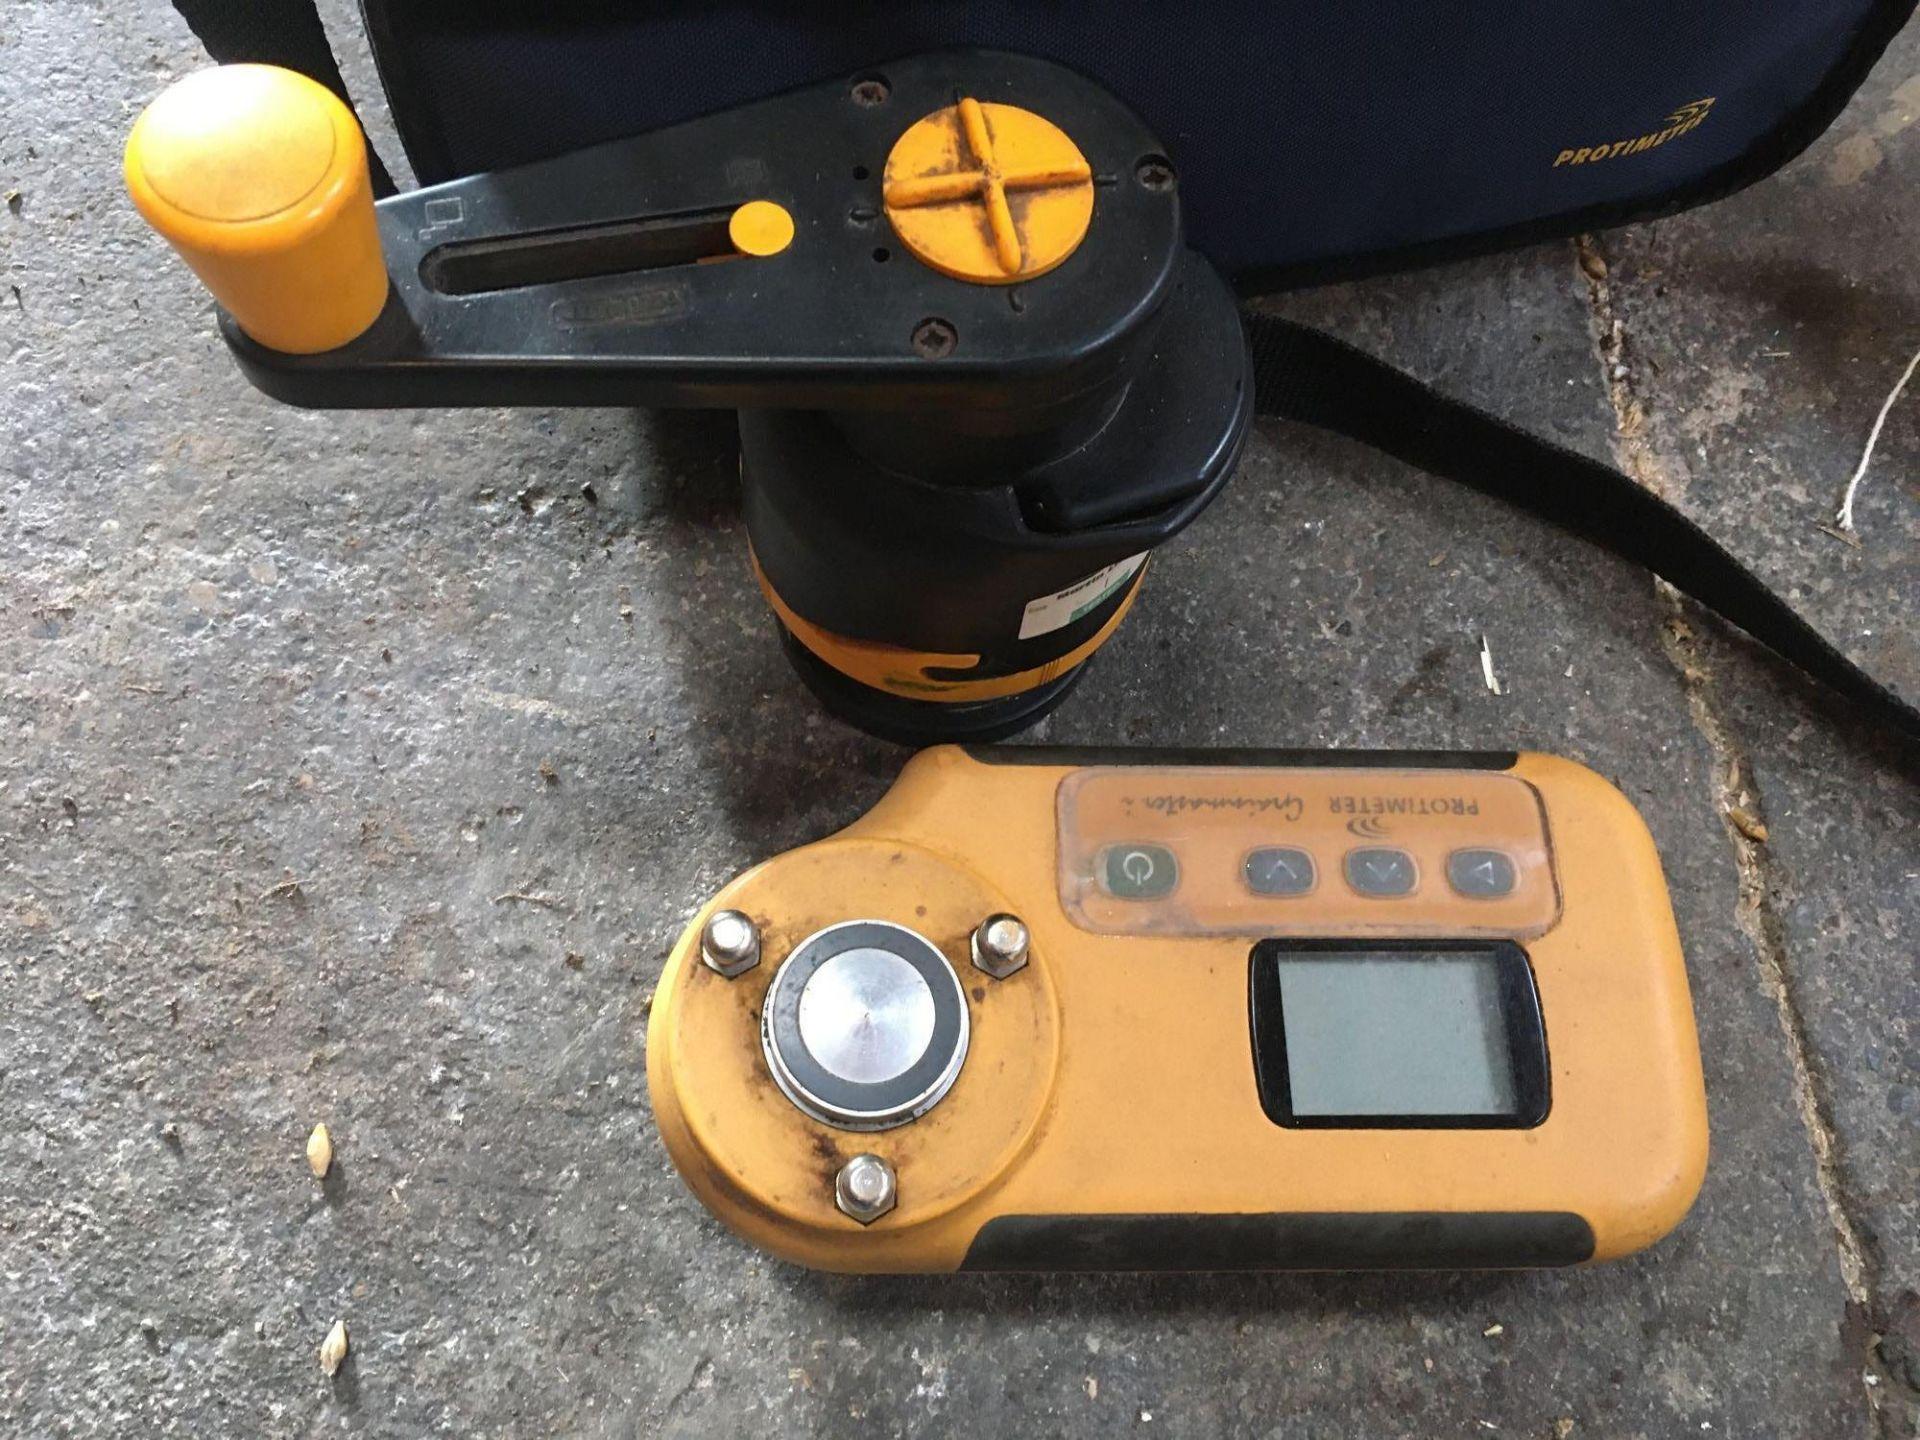 Protimeter moisture meter - Image 2 of 2